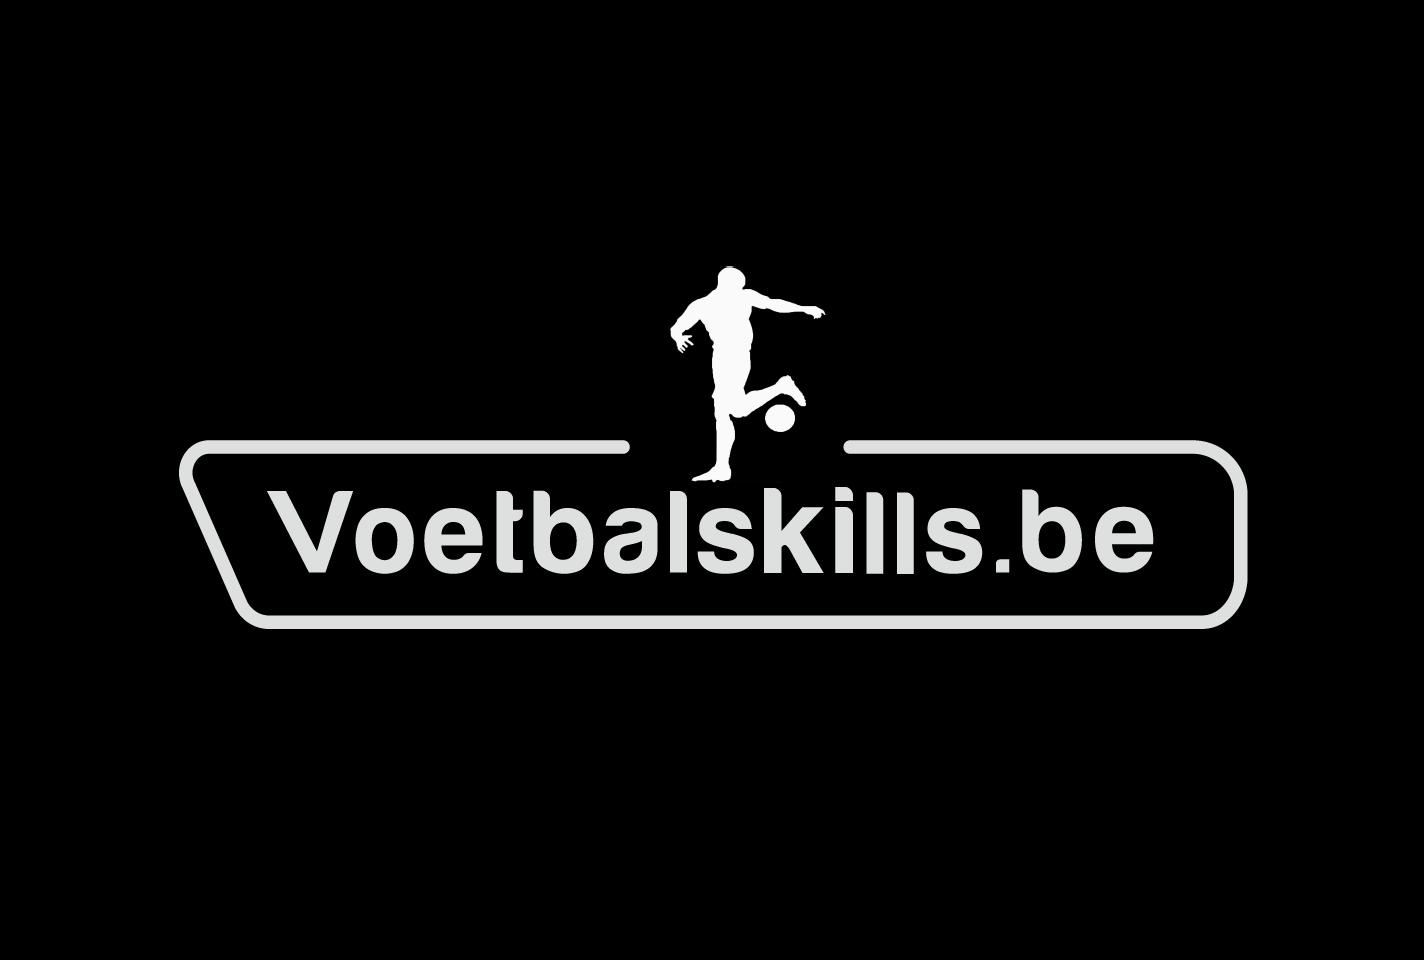 Voetbalskills.be